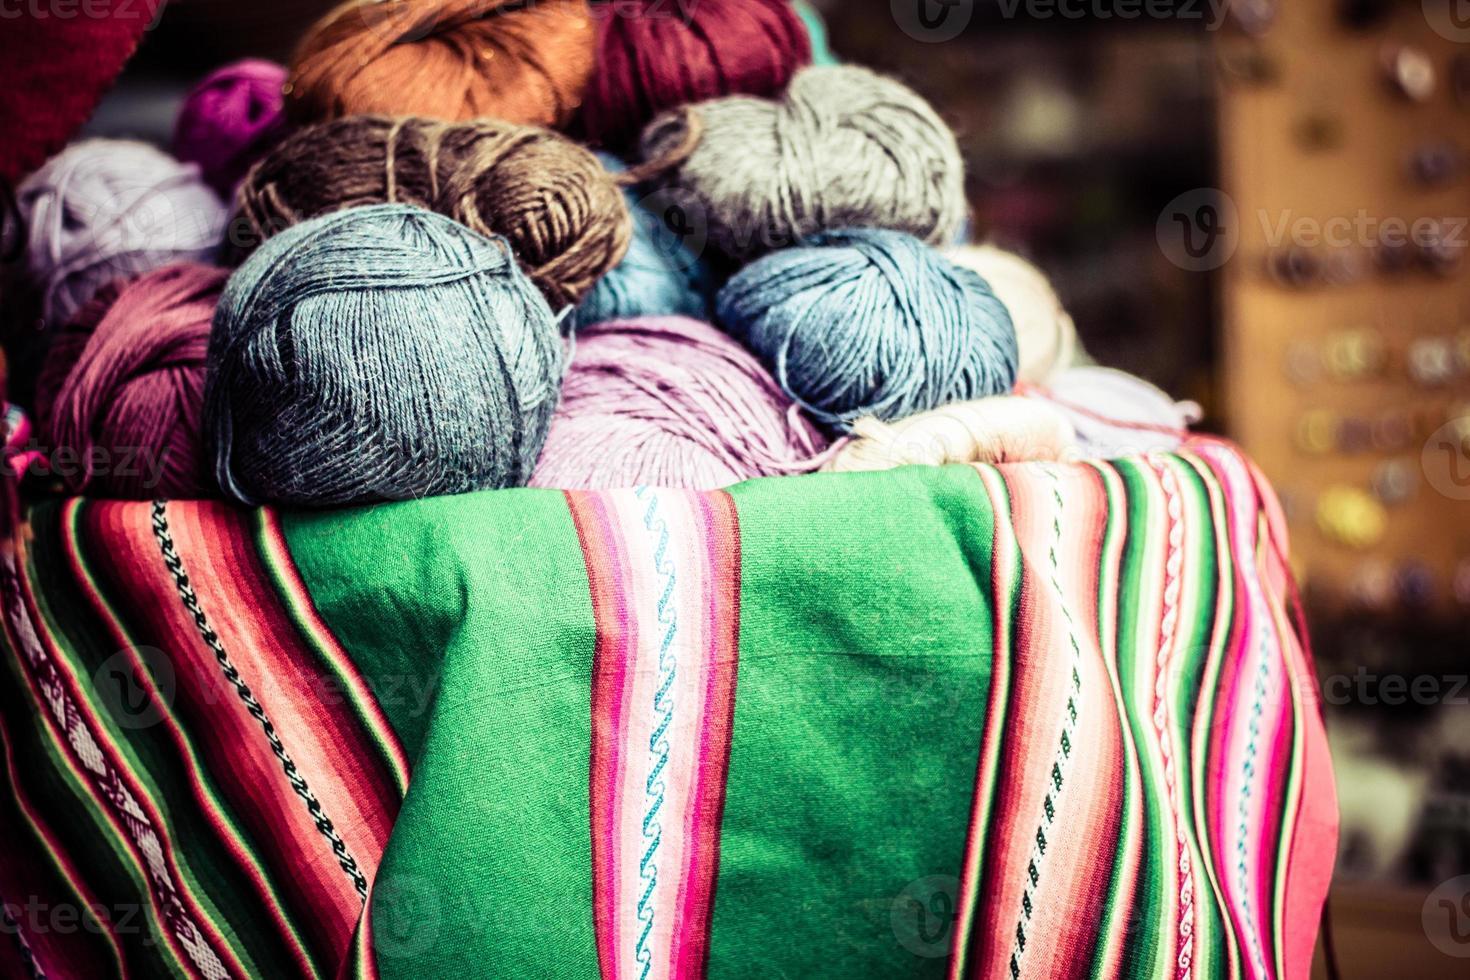 Colorful Fabric at market in Peru, South America photo